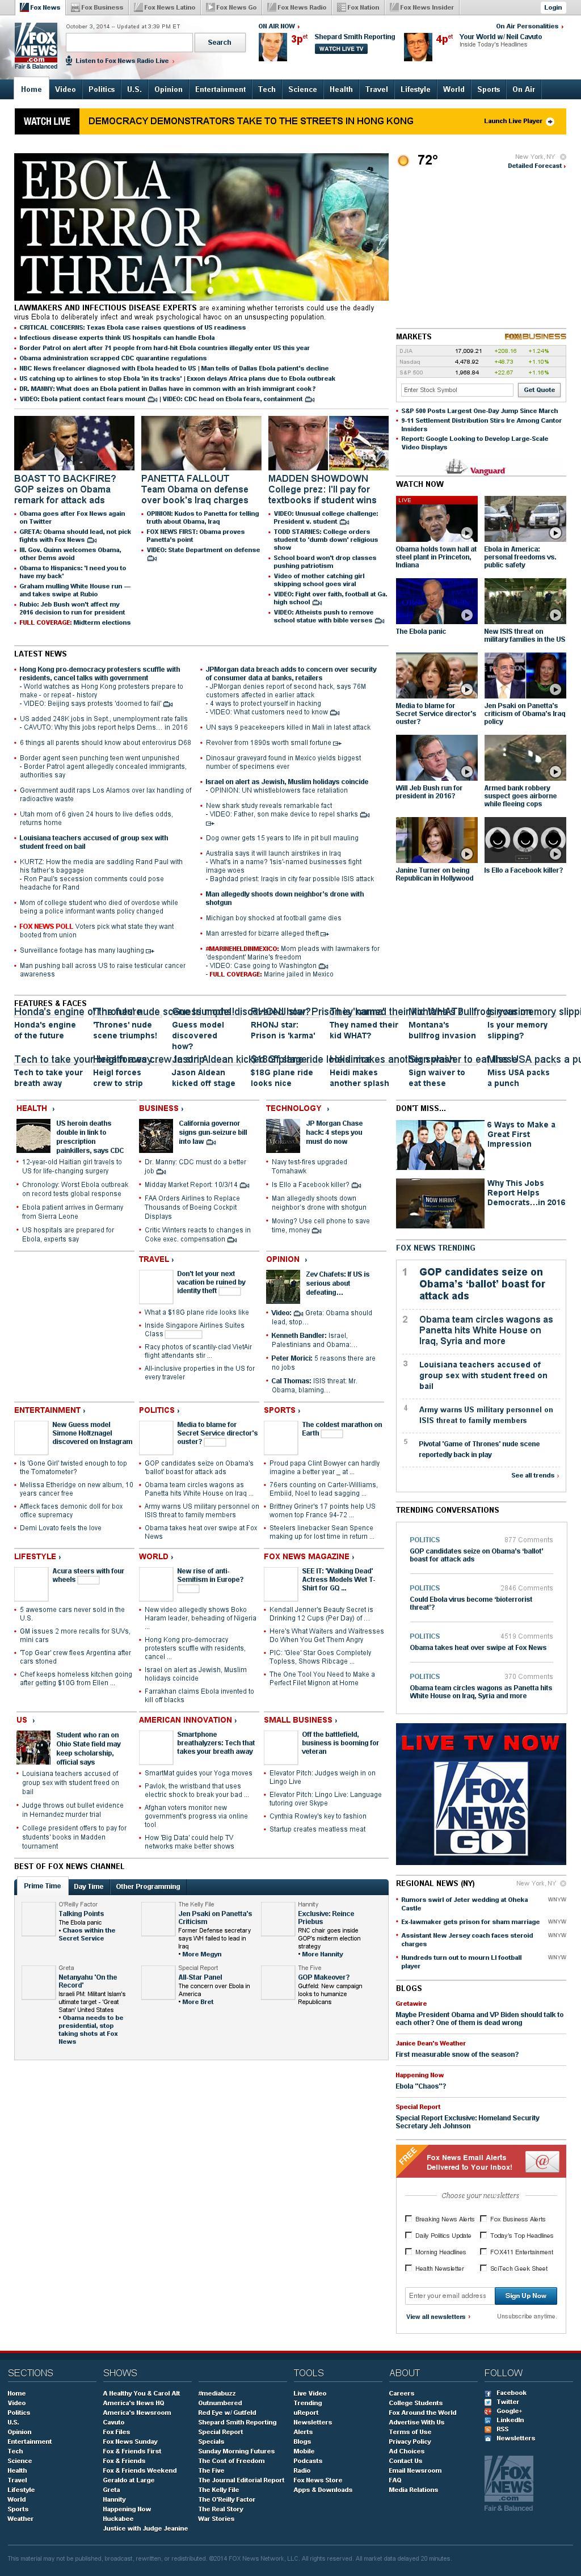 Fox News at Friday Oct. 3, 2014, 8:06 p.m. UTC